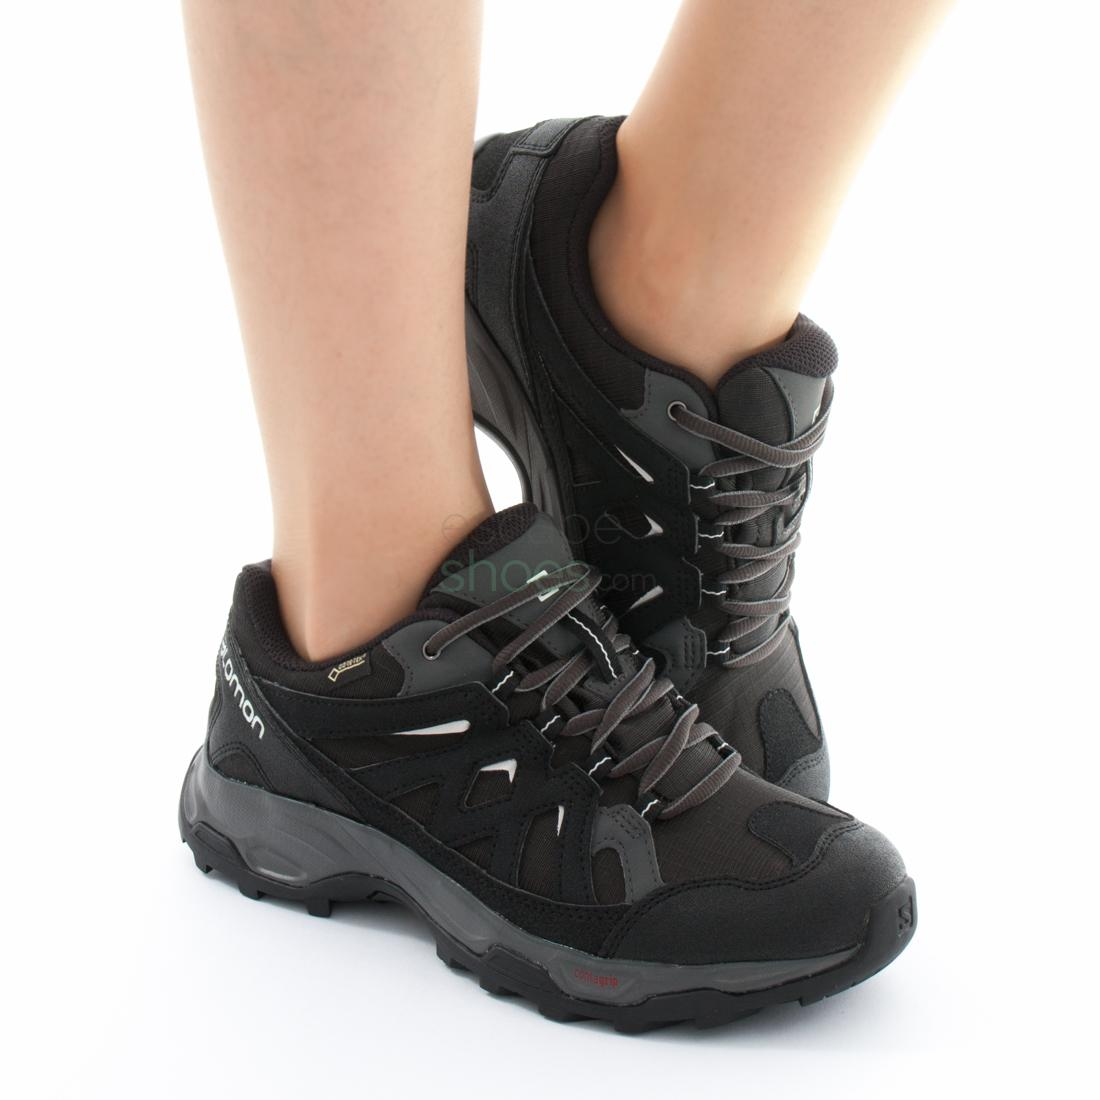 Zapatillas Salomon Effect GTX W Negro